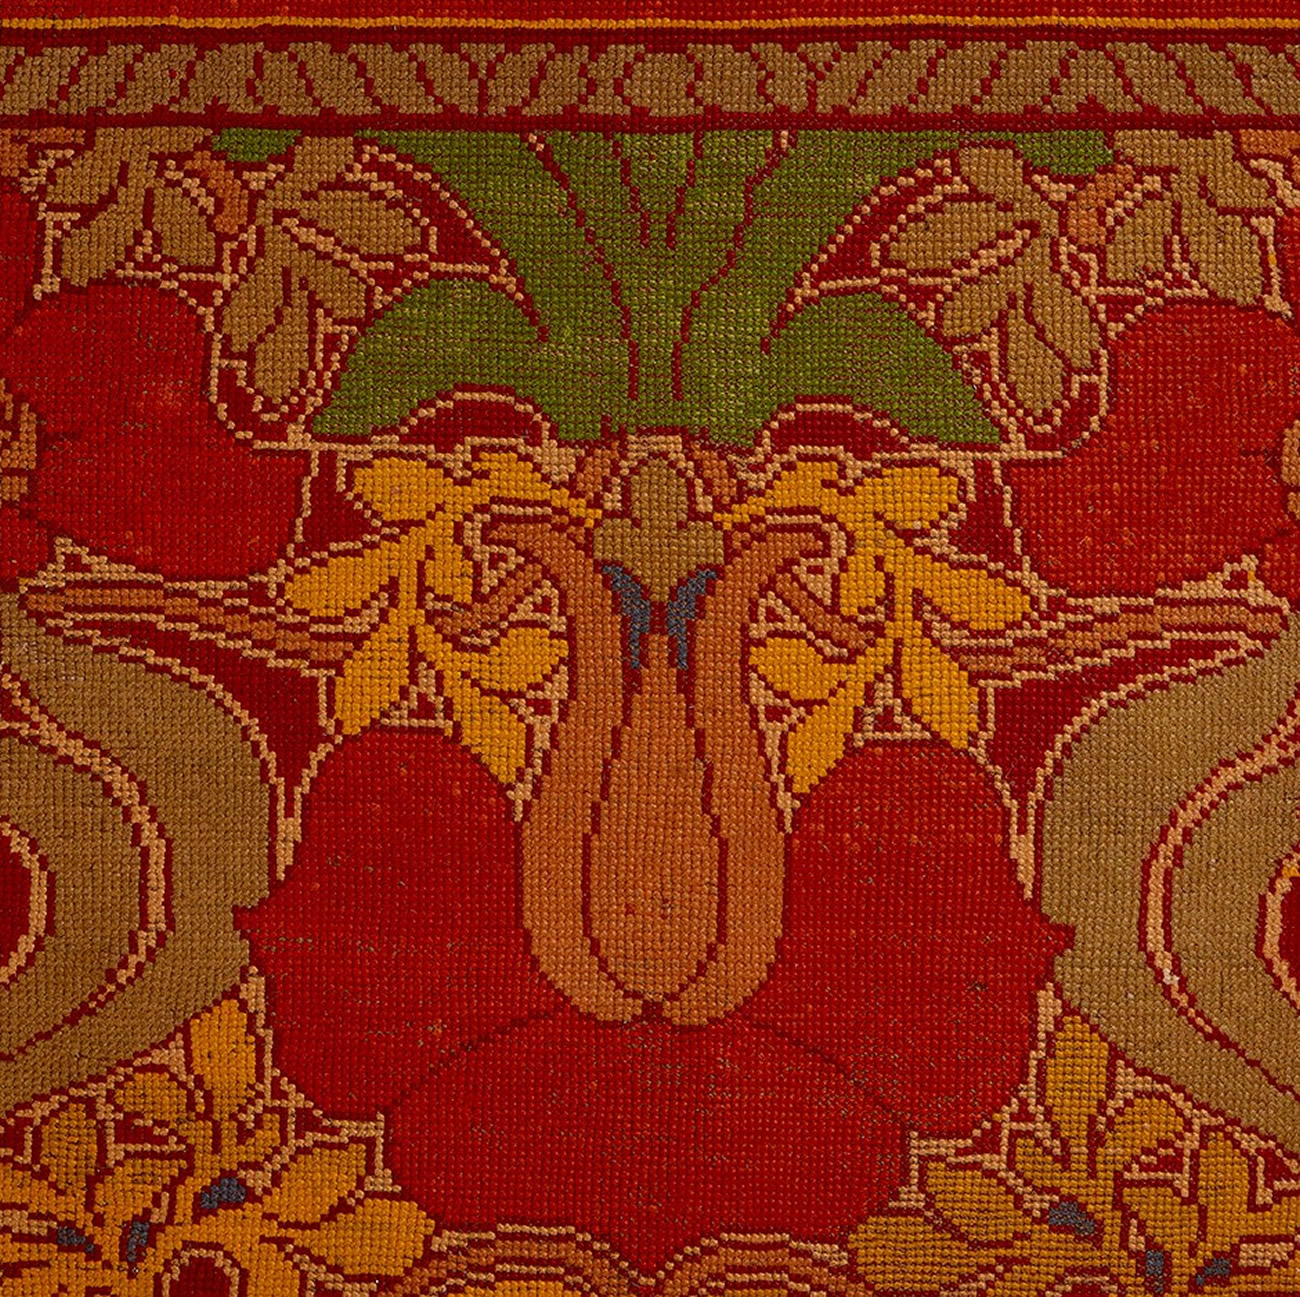 Carpet (detail) Manufactured by Alexander Morton & Co.